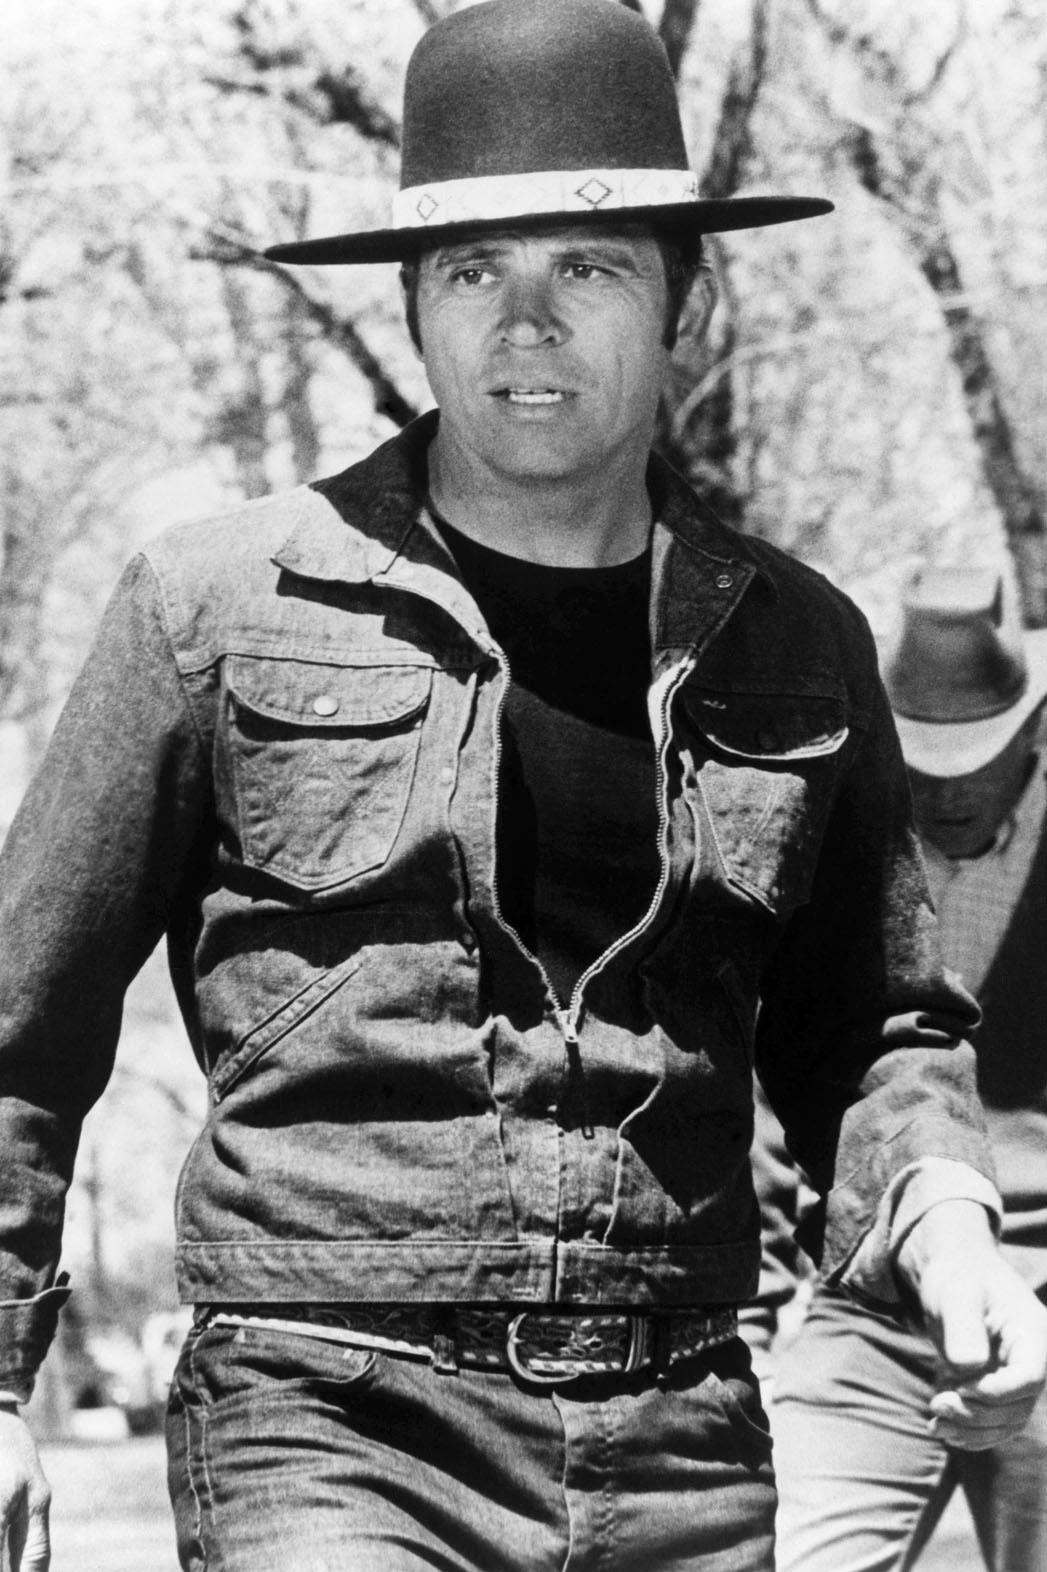 Tom Laughlin as Billy Jack - P 2013